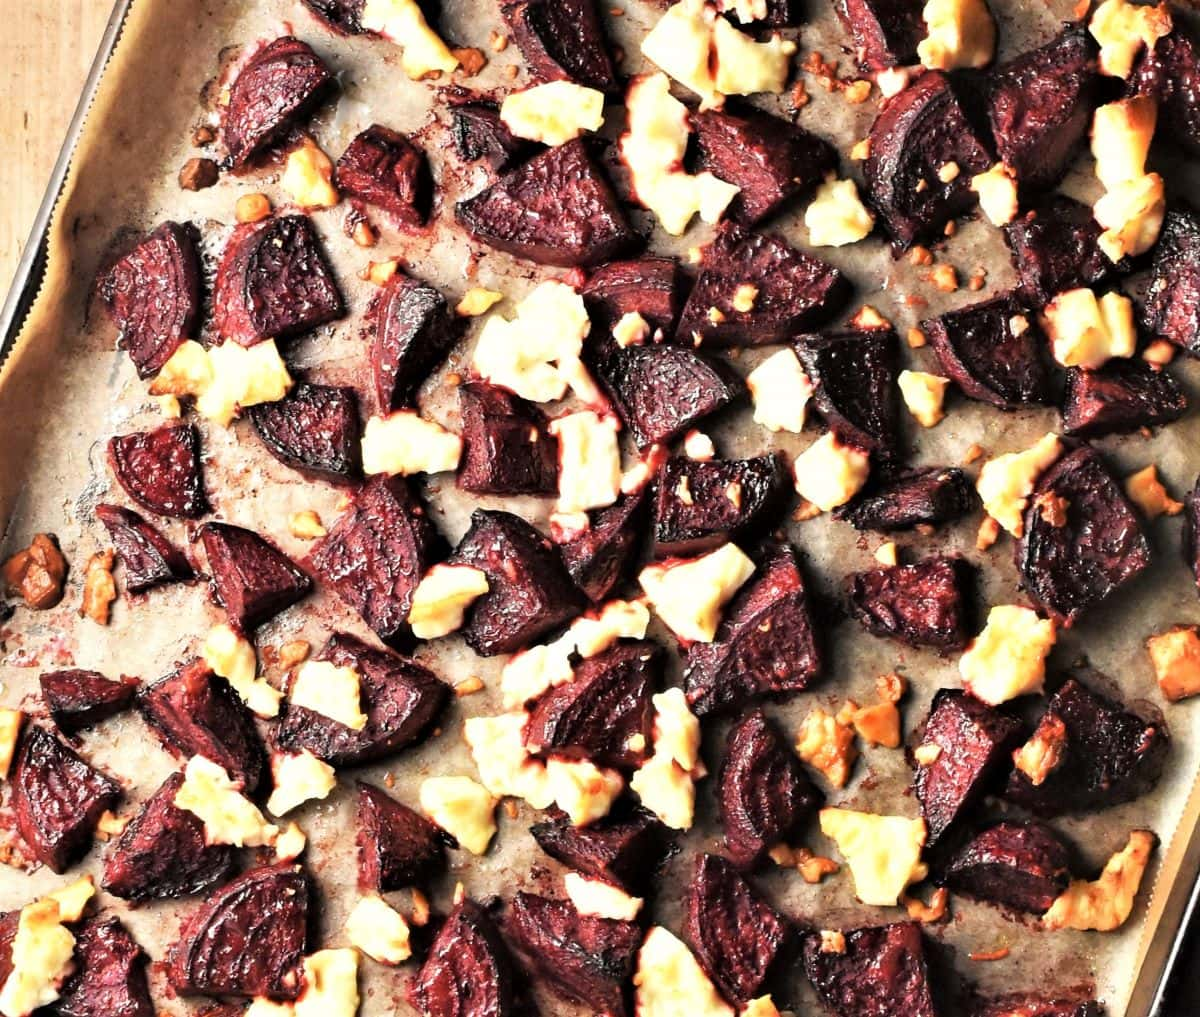 Roasted beet wedges and crumbled feta on baking sheet.